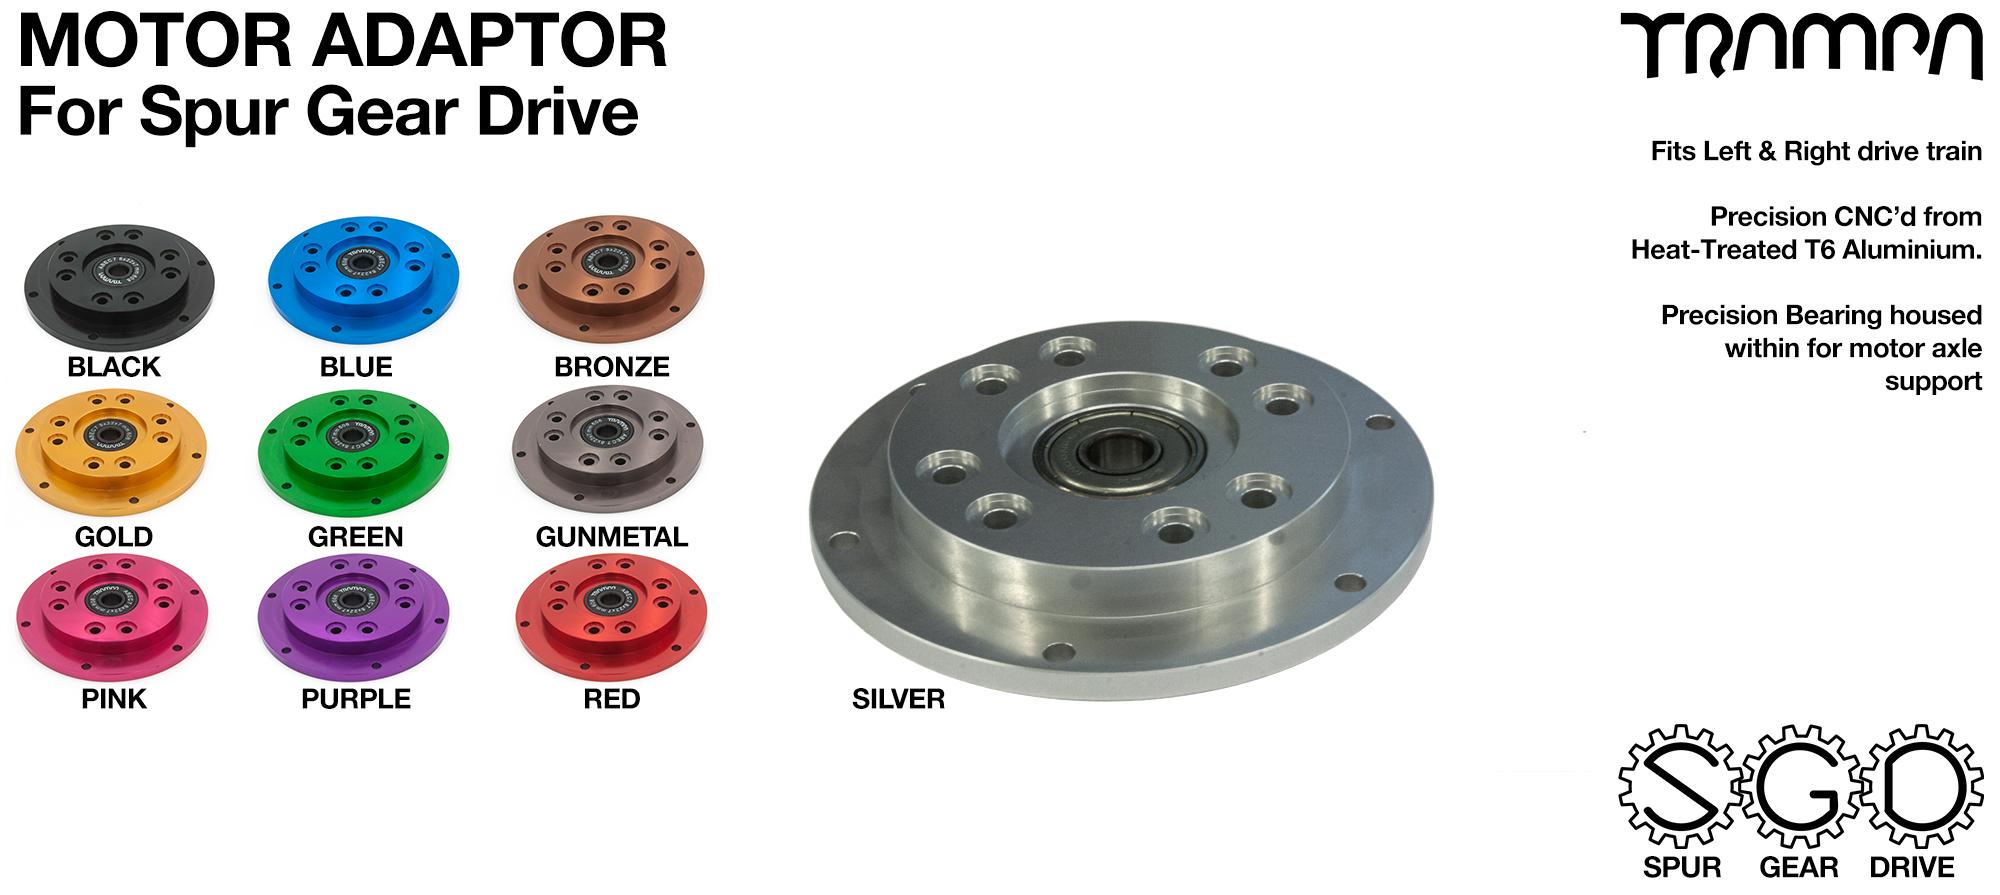 SPUR Gear Drive Motor Adaptor